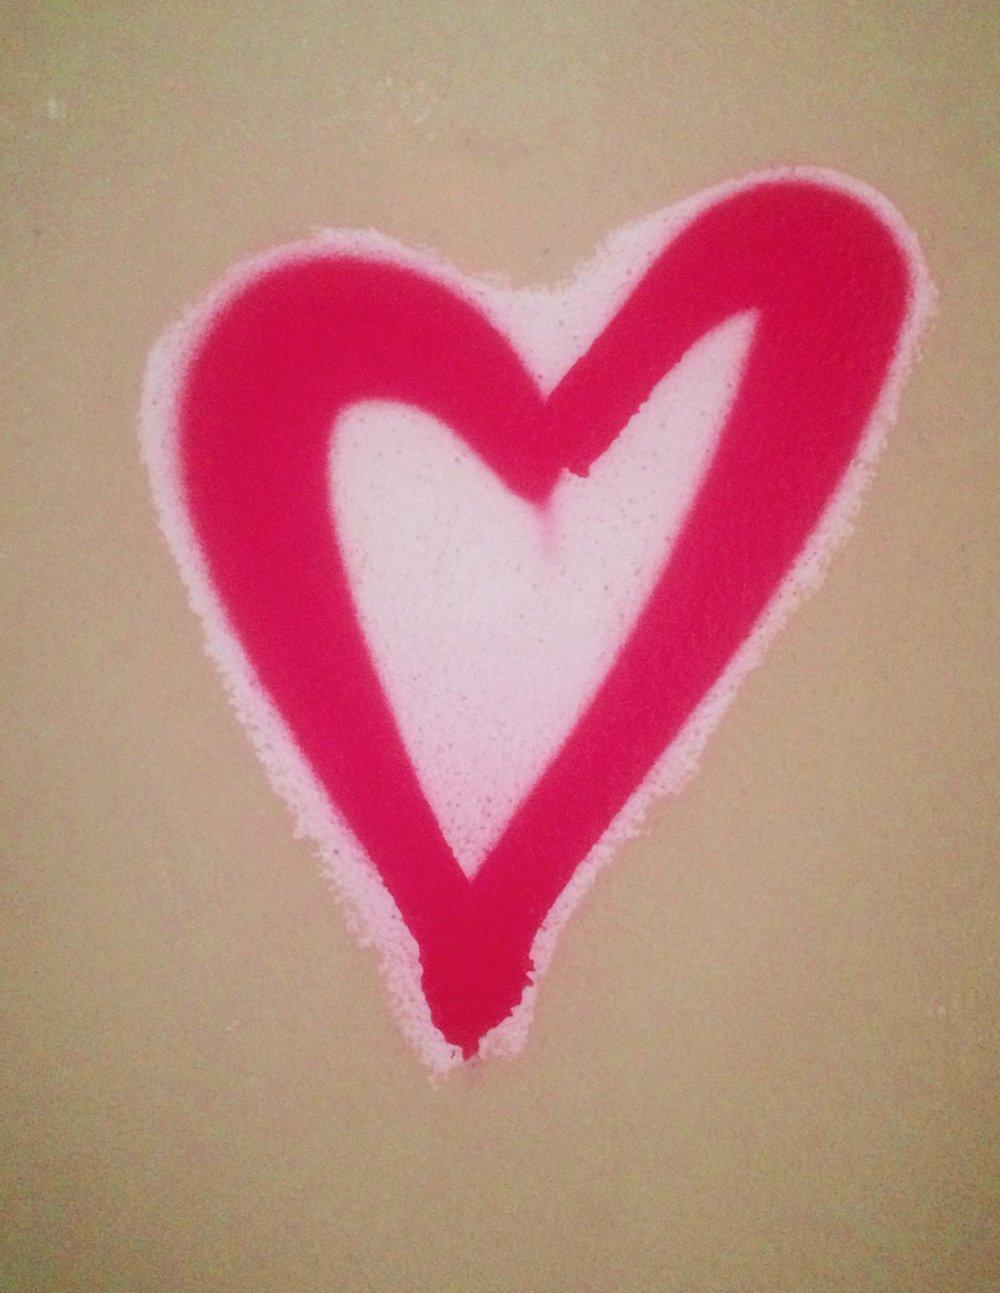 heart-pink.jpg